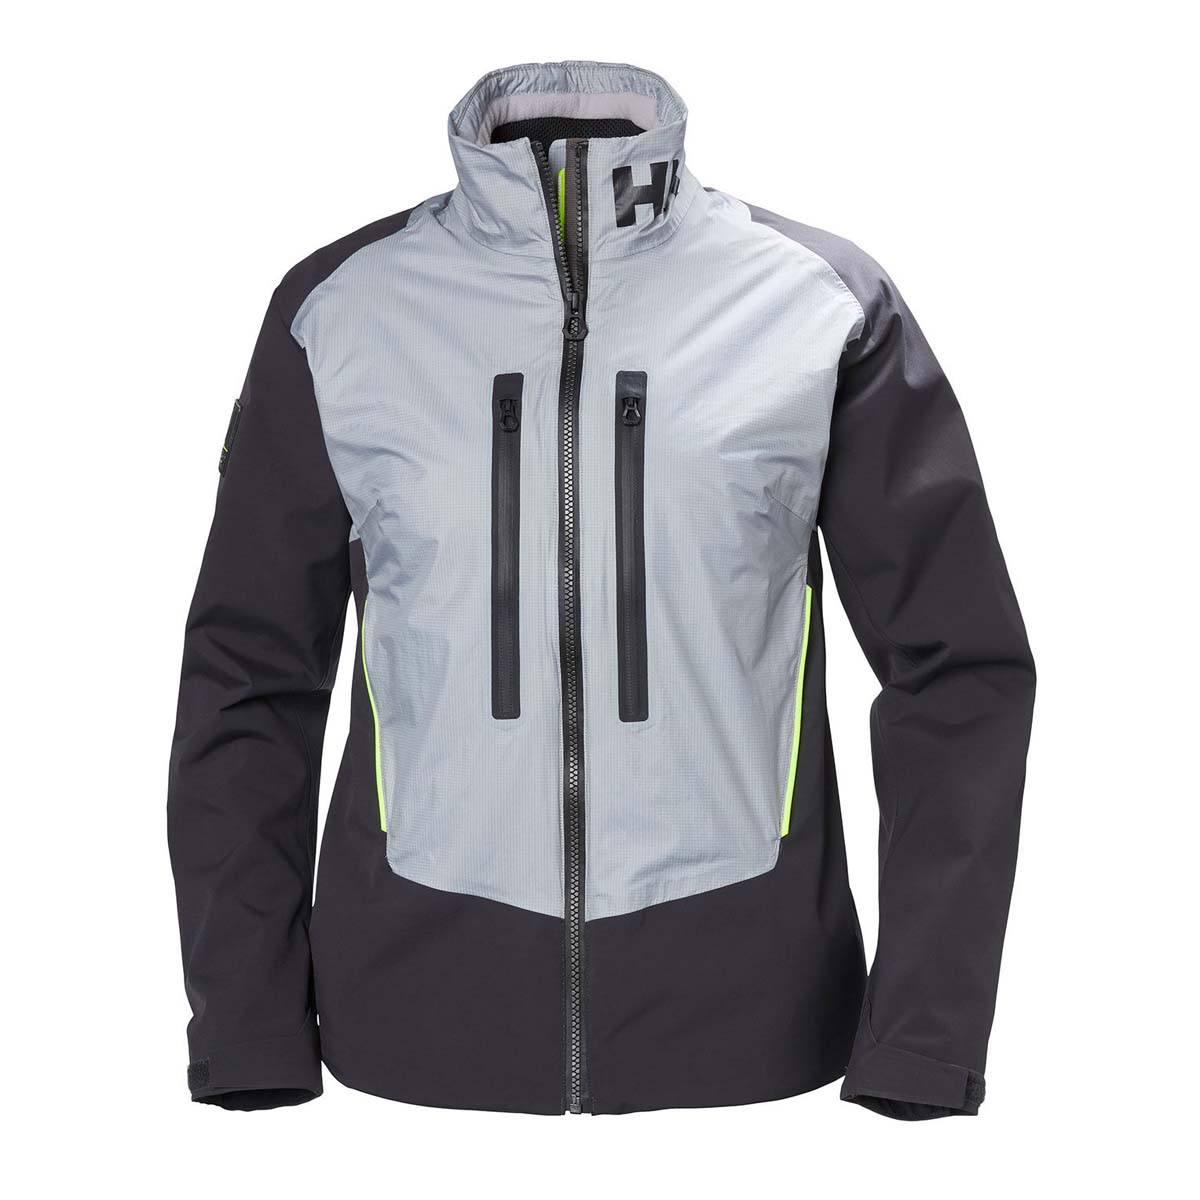 Helly Hansen Women's Aegir H2Flow Jacket (33922)